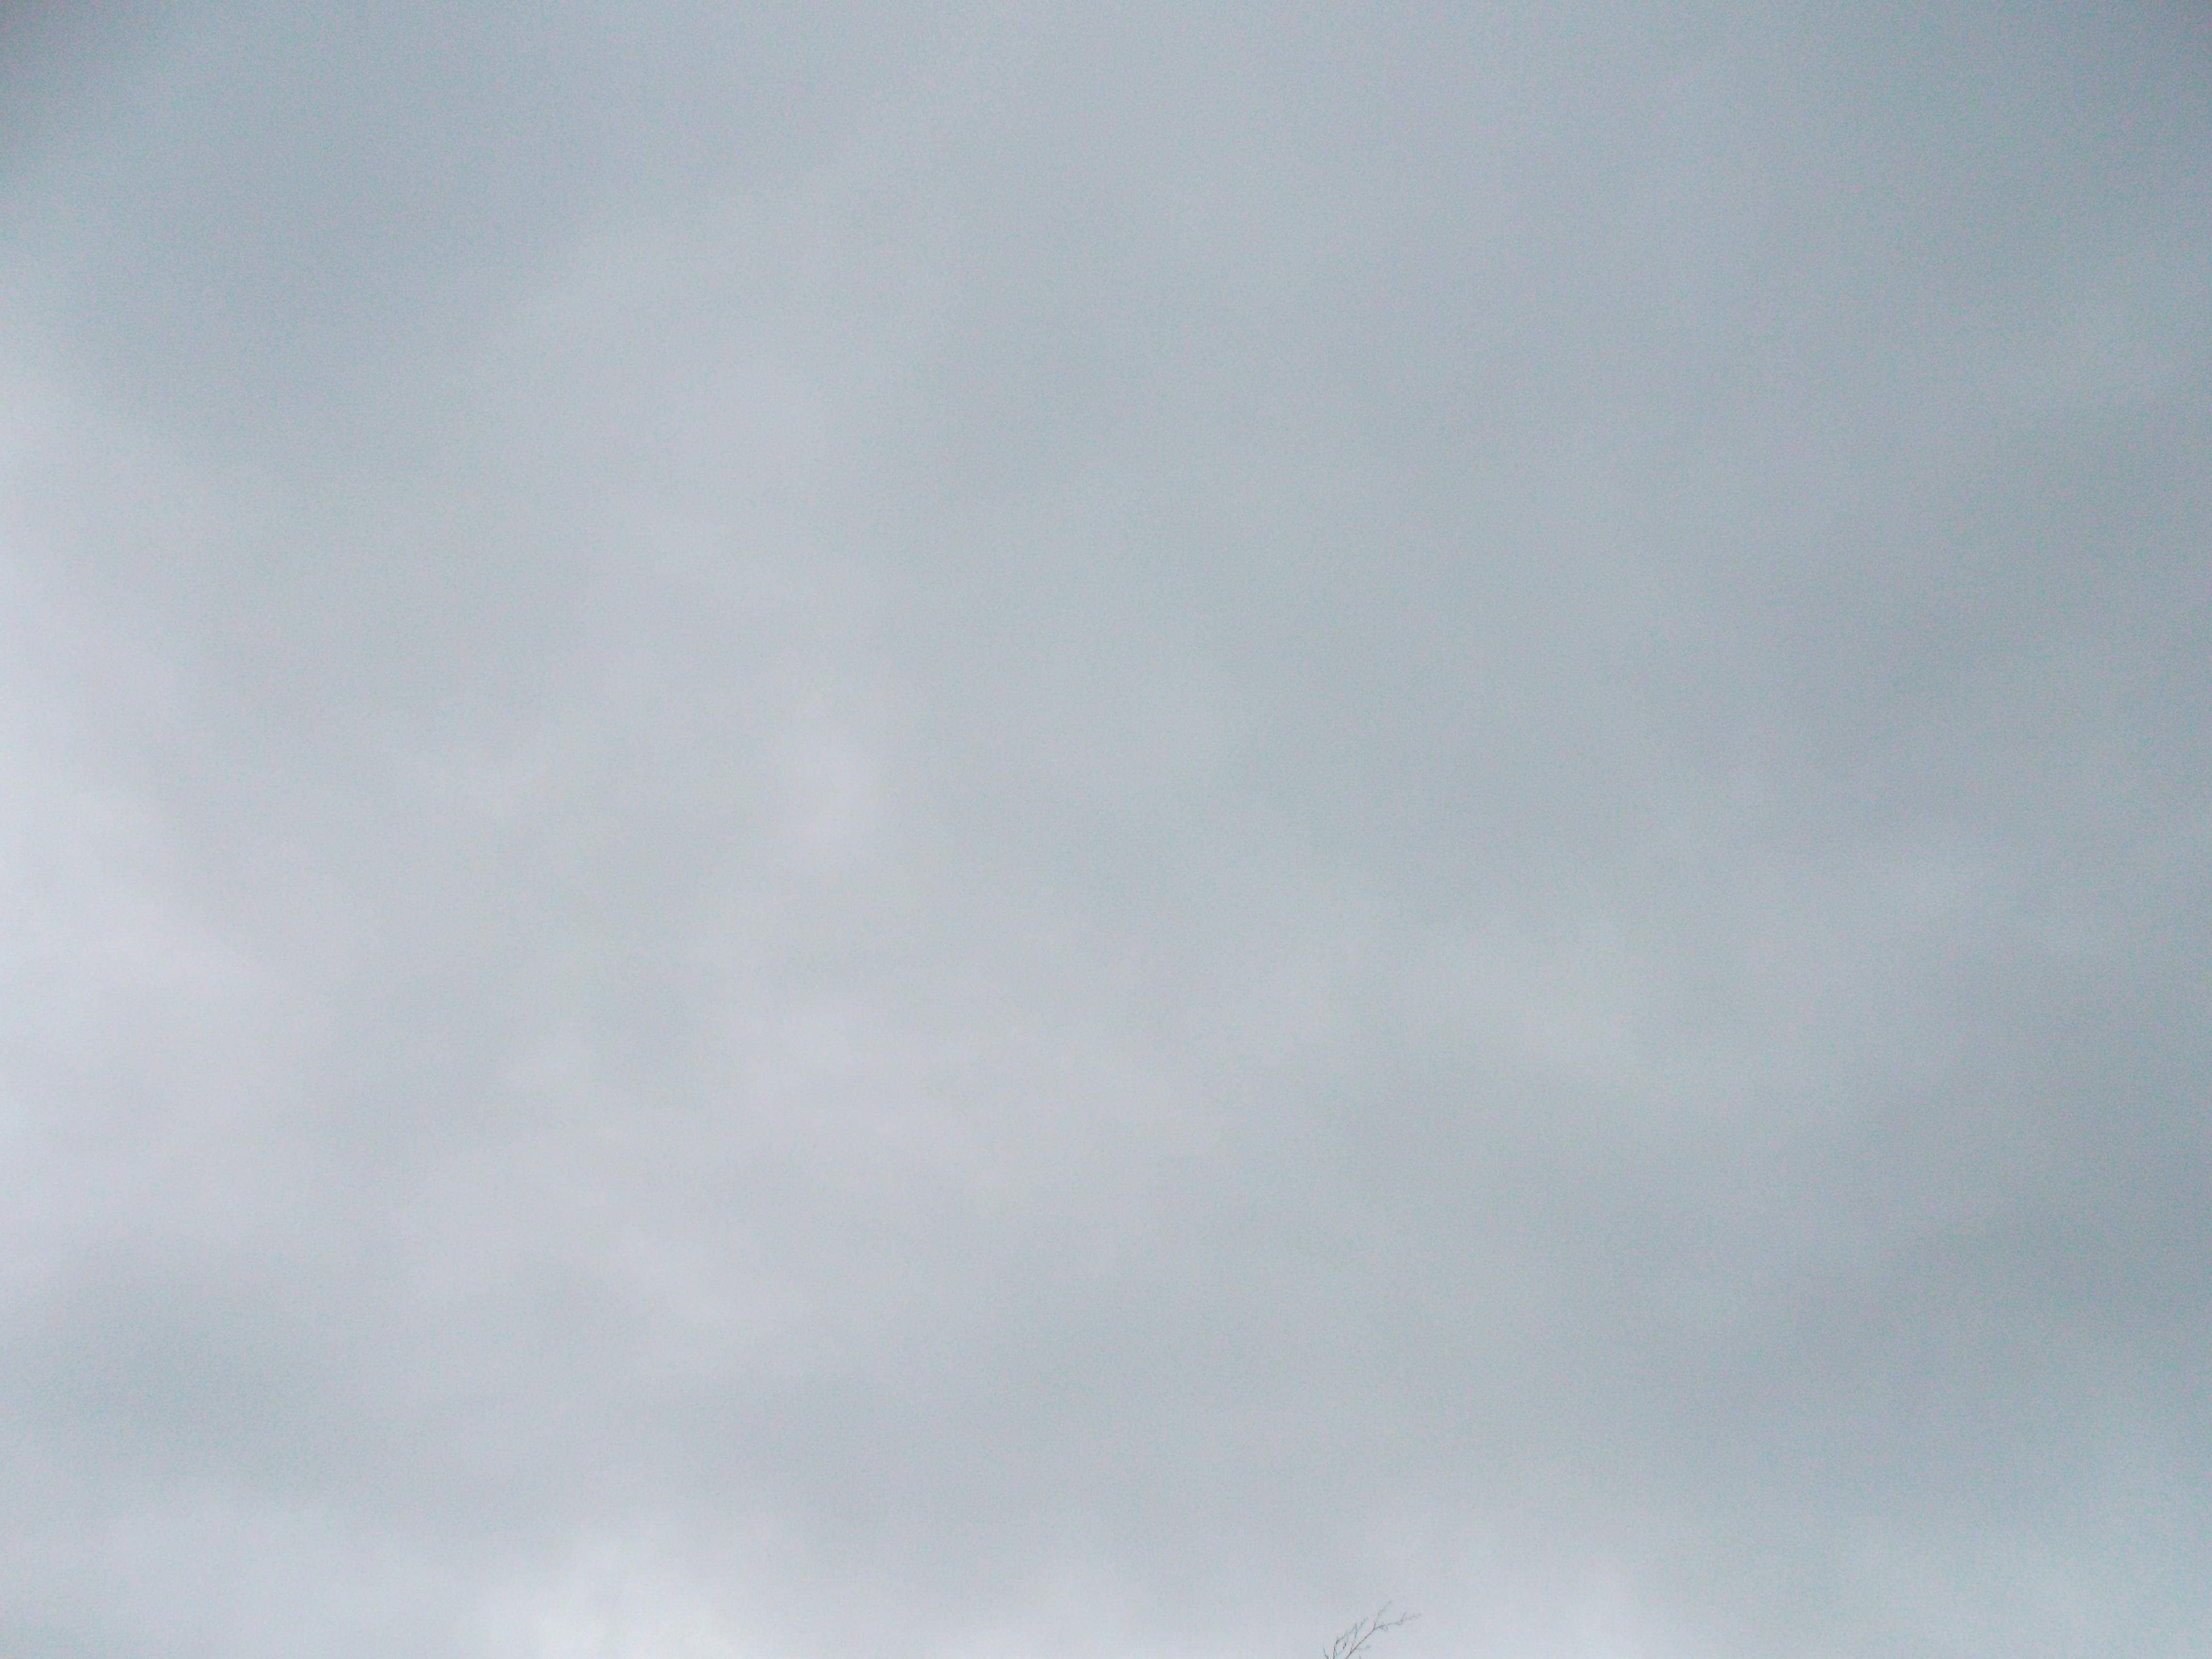 2013-02-01 Longitude -0.371 Latitude 49.182 Altitude 13 Heure 15h55